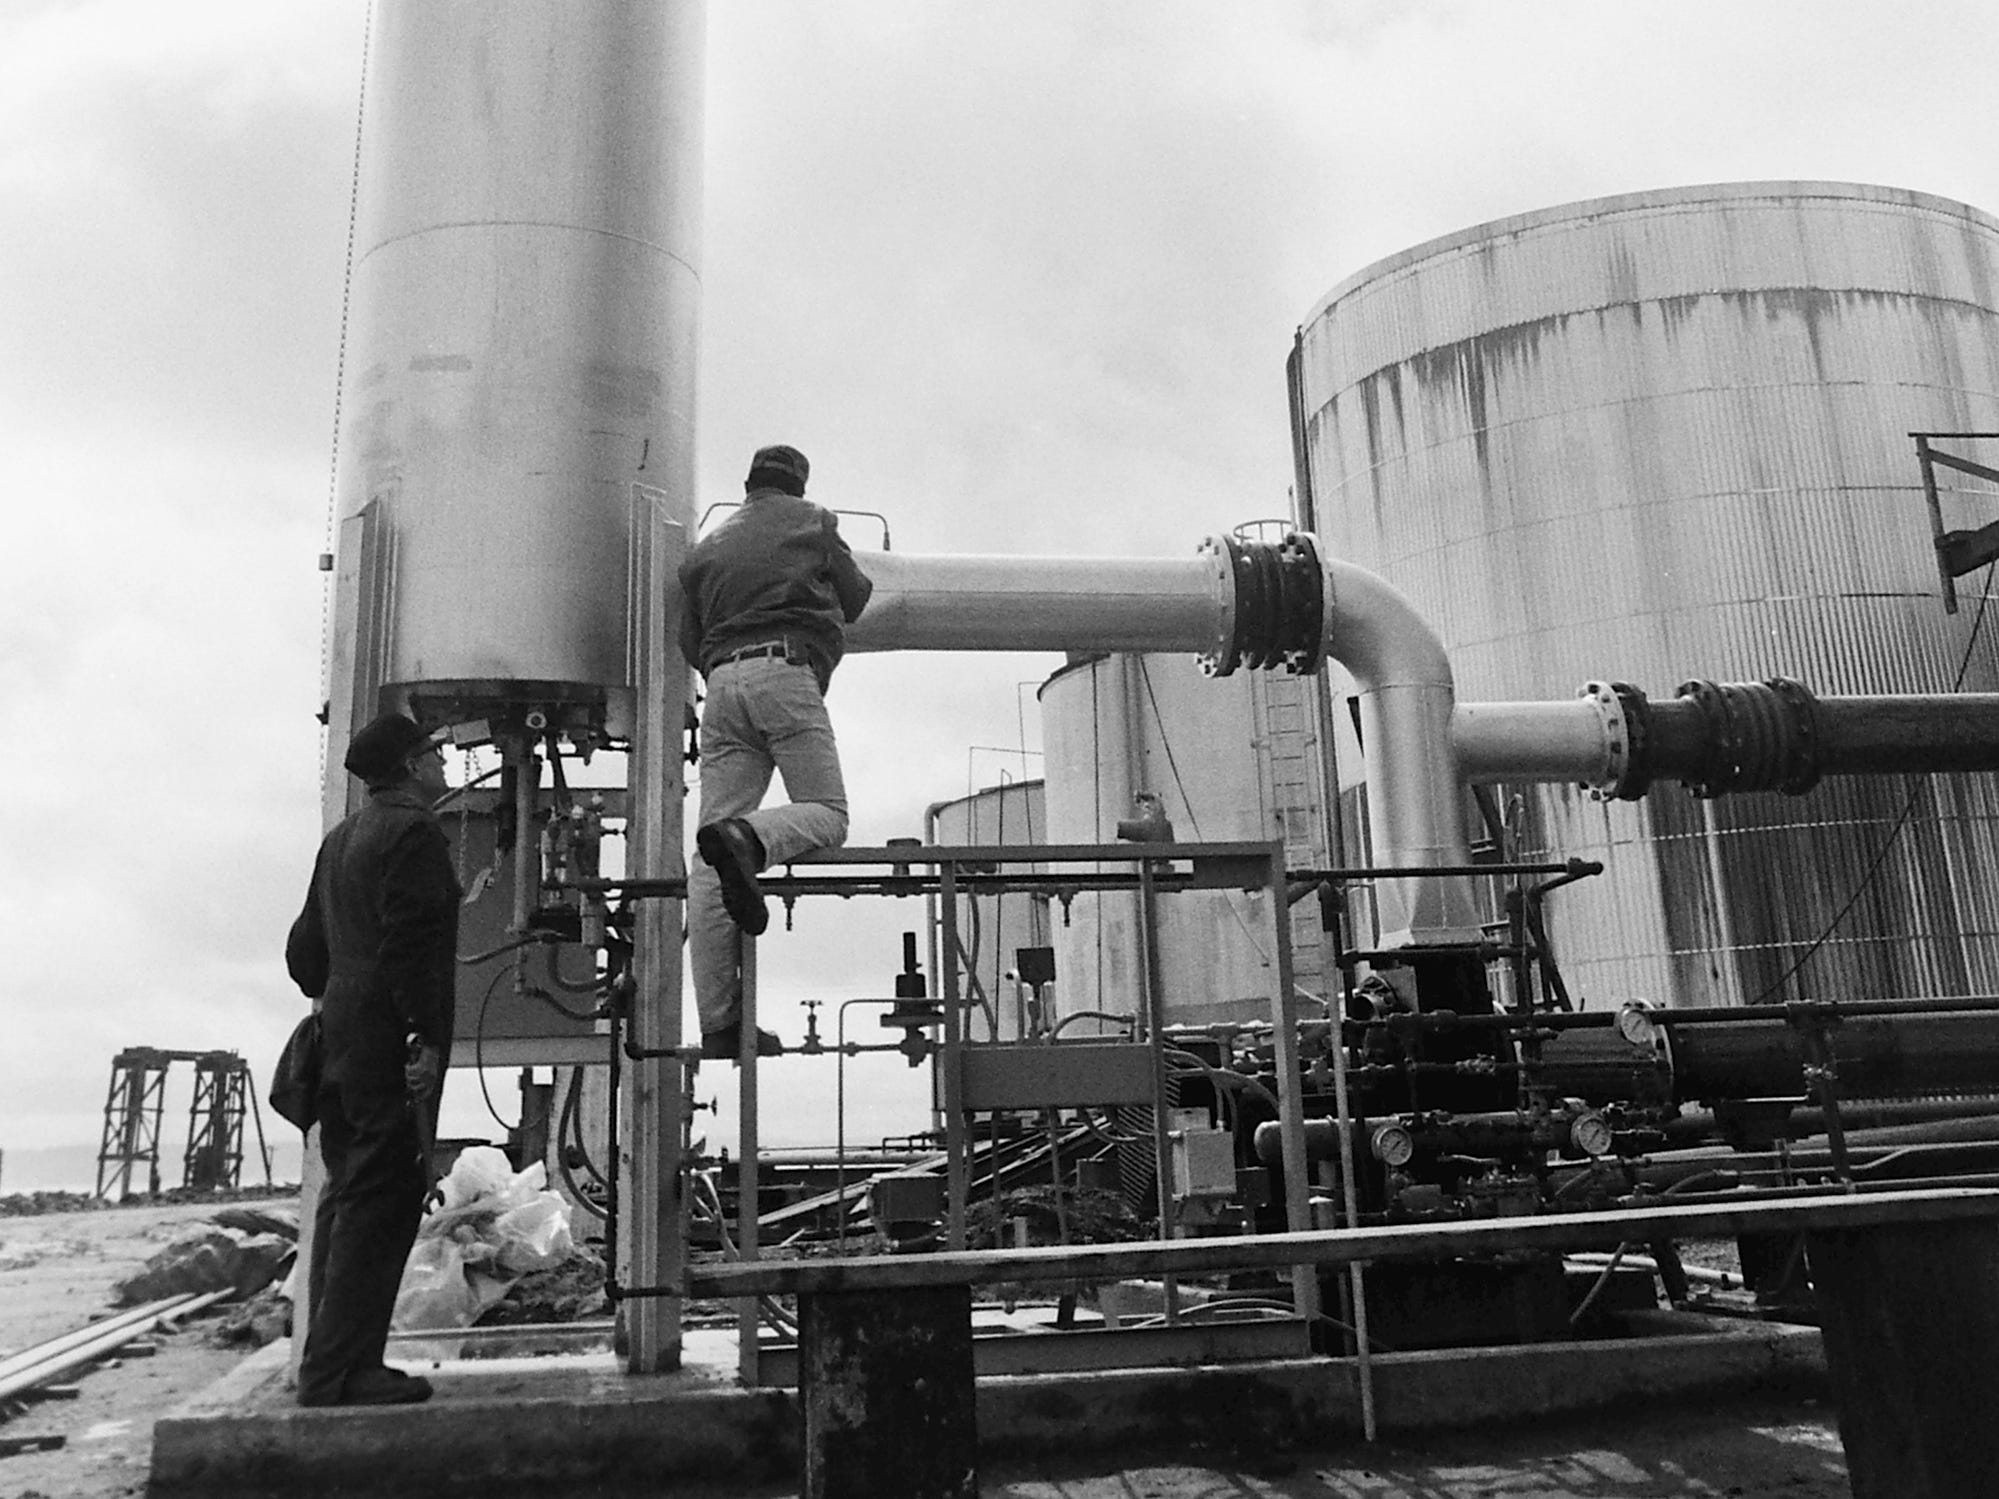 04/15/87Wycoff Plant